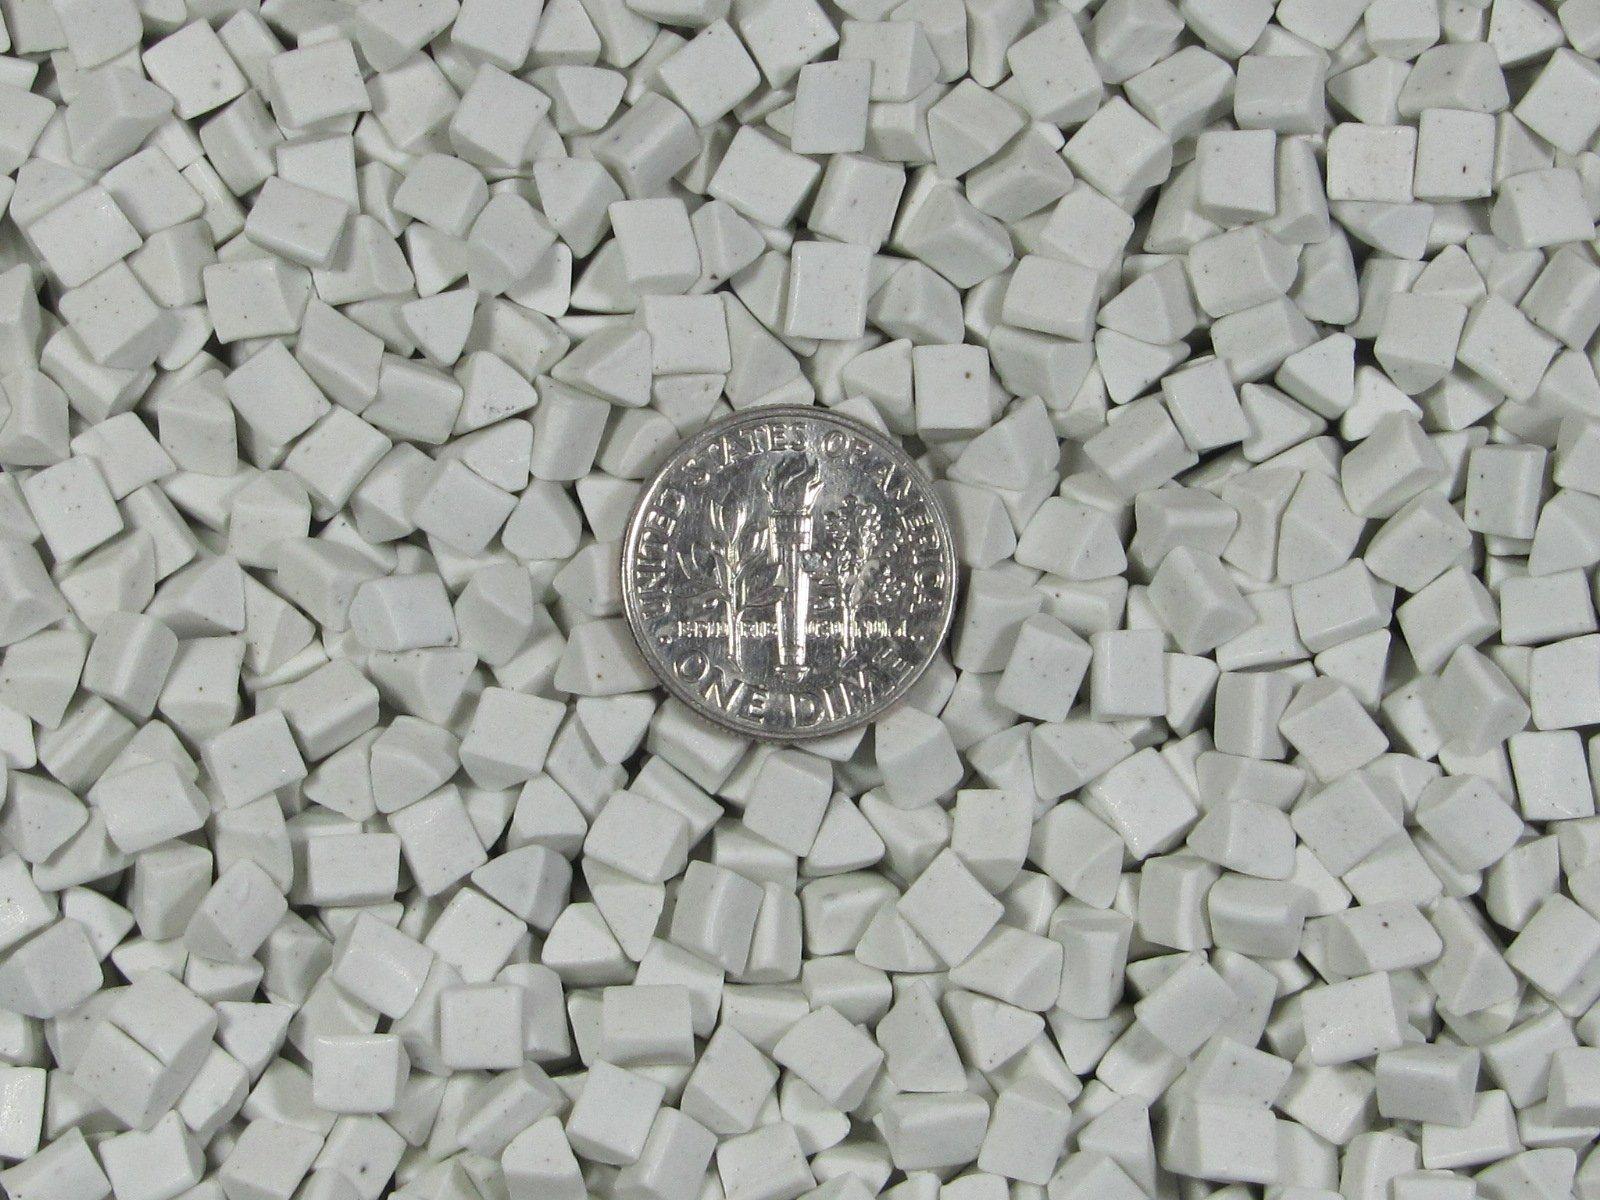 Ceramic Porcelain Tumbling Media 6 Lbs. 4 mm X 4 mm Polishing Triangles (White)